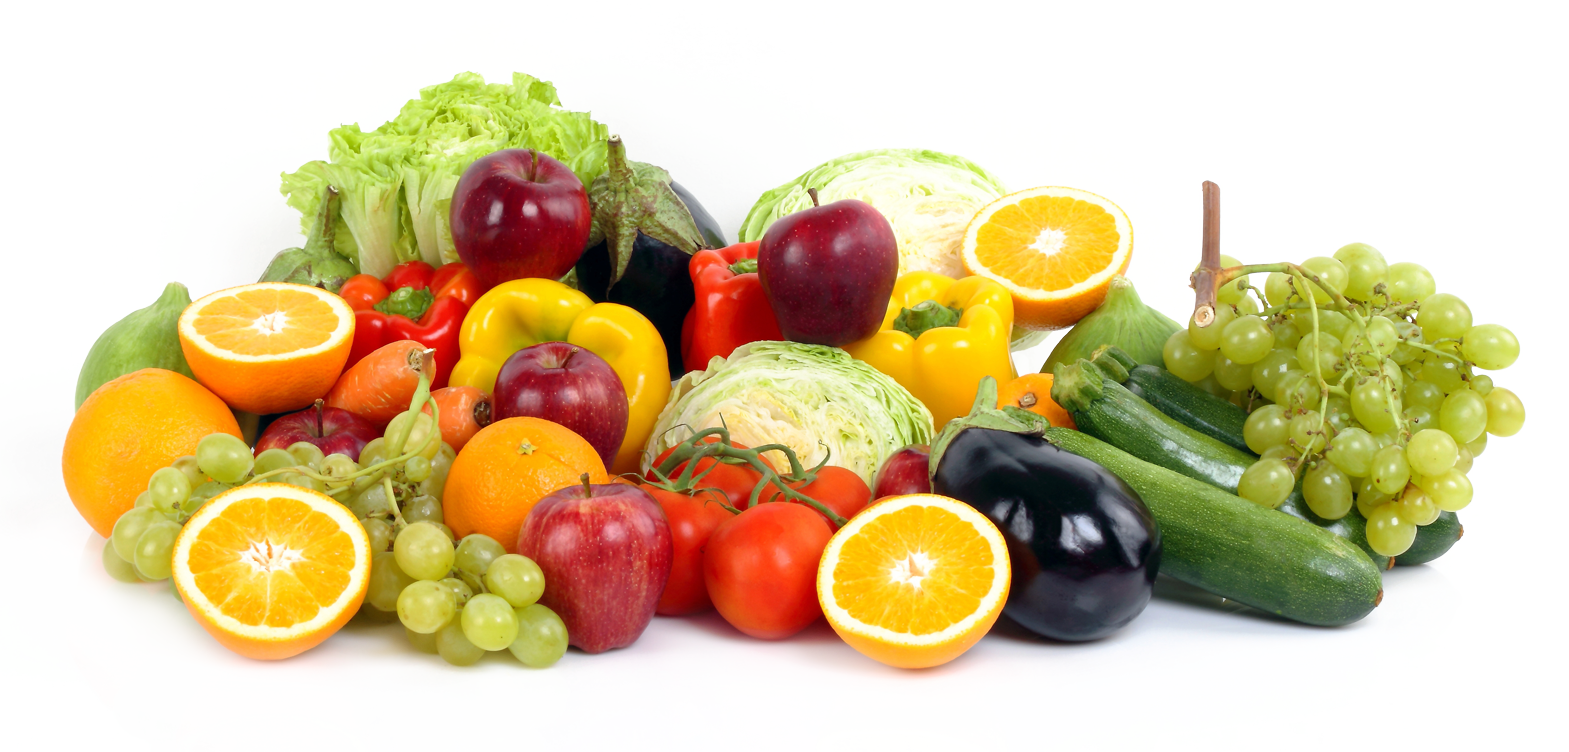 Foods PNG - 33335